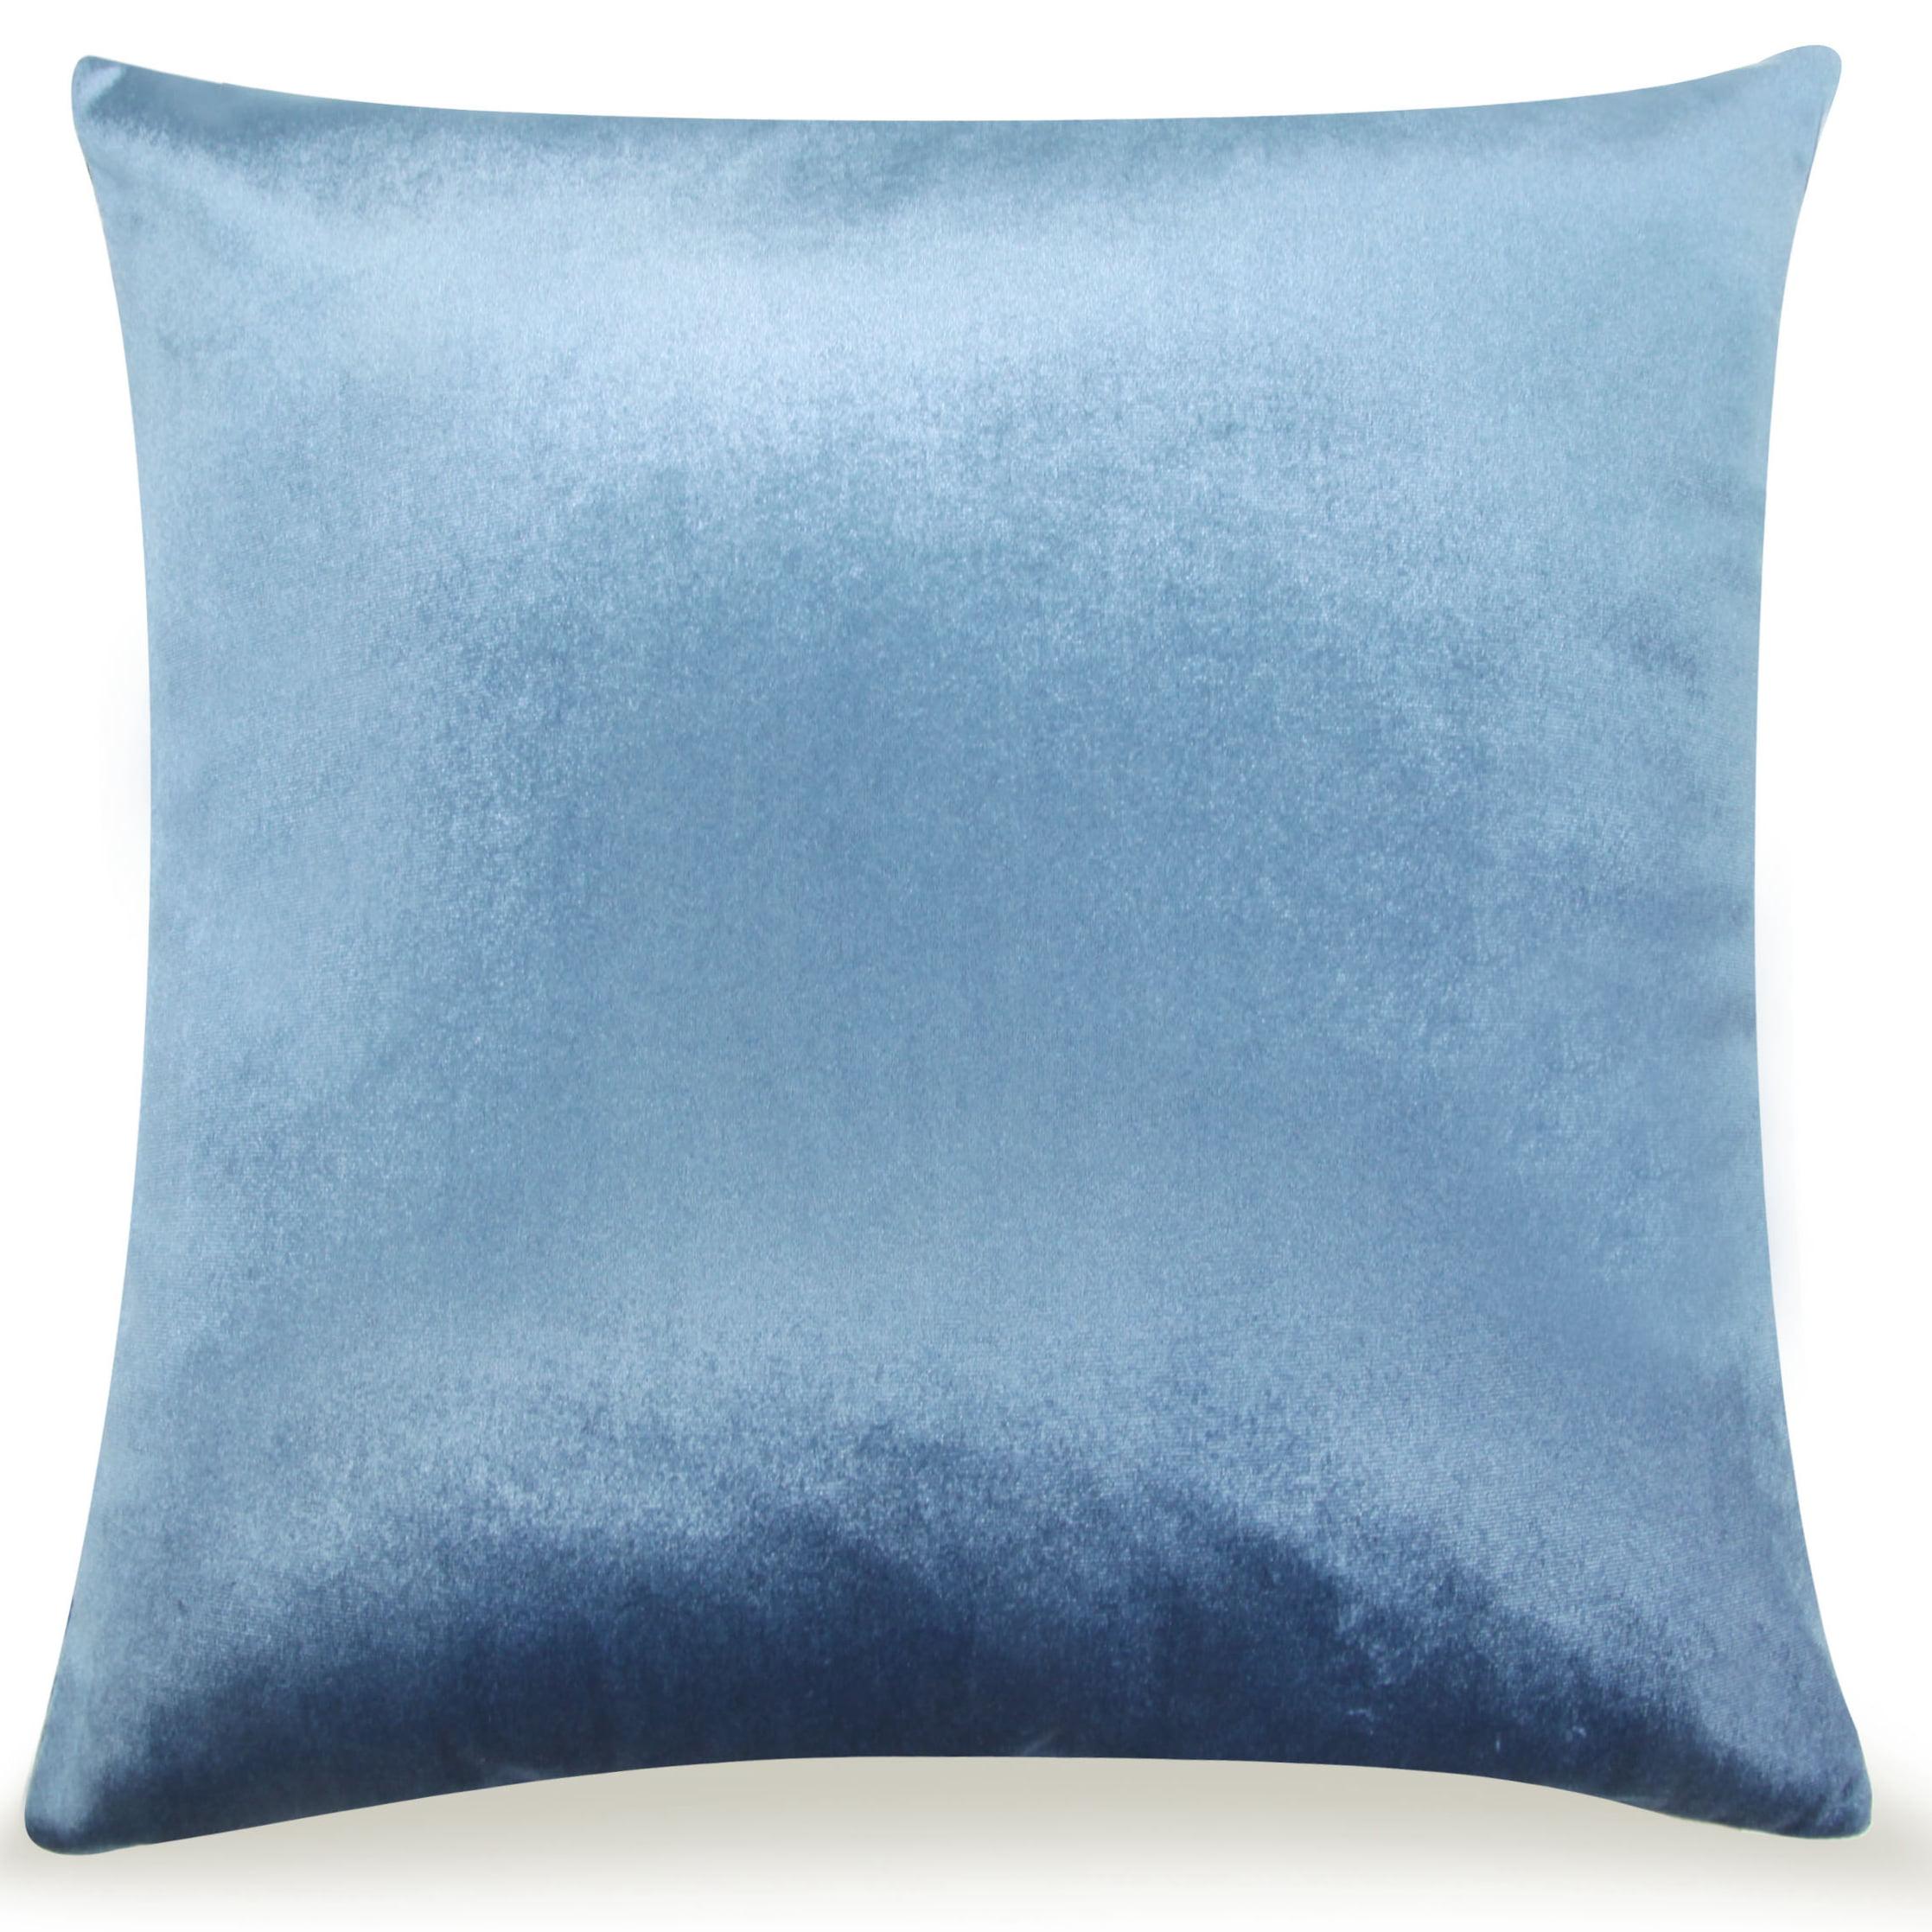 Pal Fabric Velvet Cushion Sham Throw Decroractive Sofa Pillow Cover 18x18 inches (LIGHT... by Pal Fabric